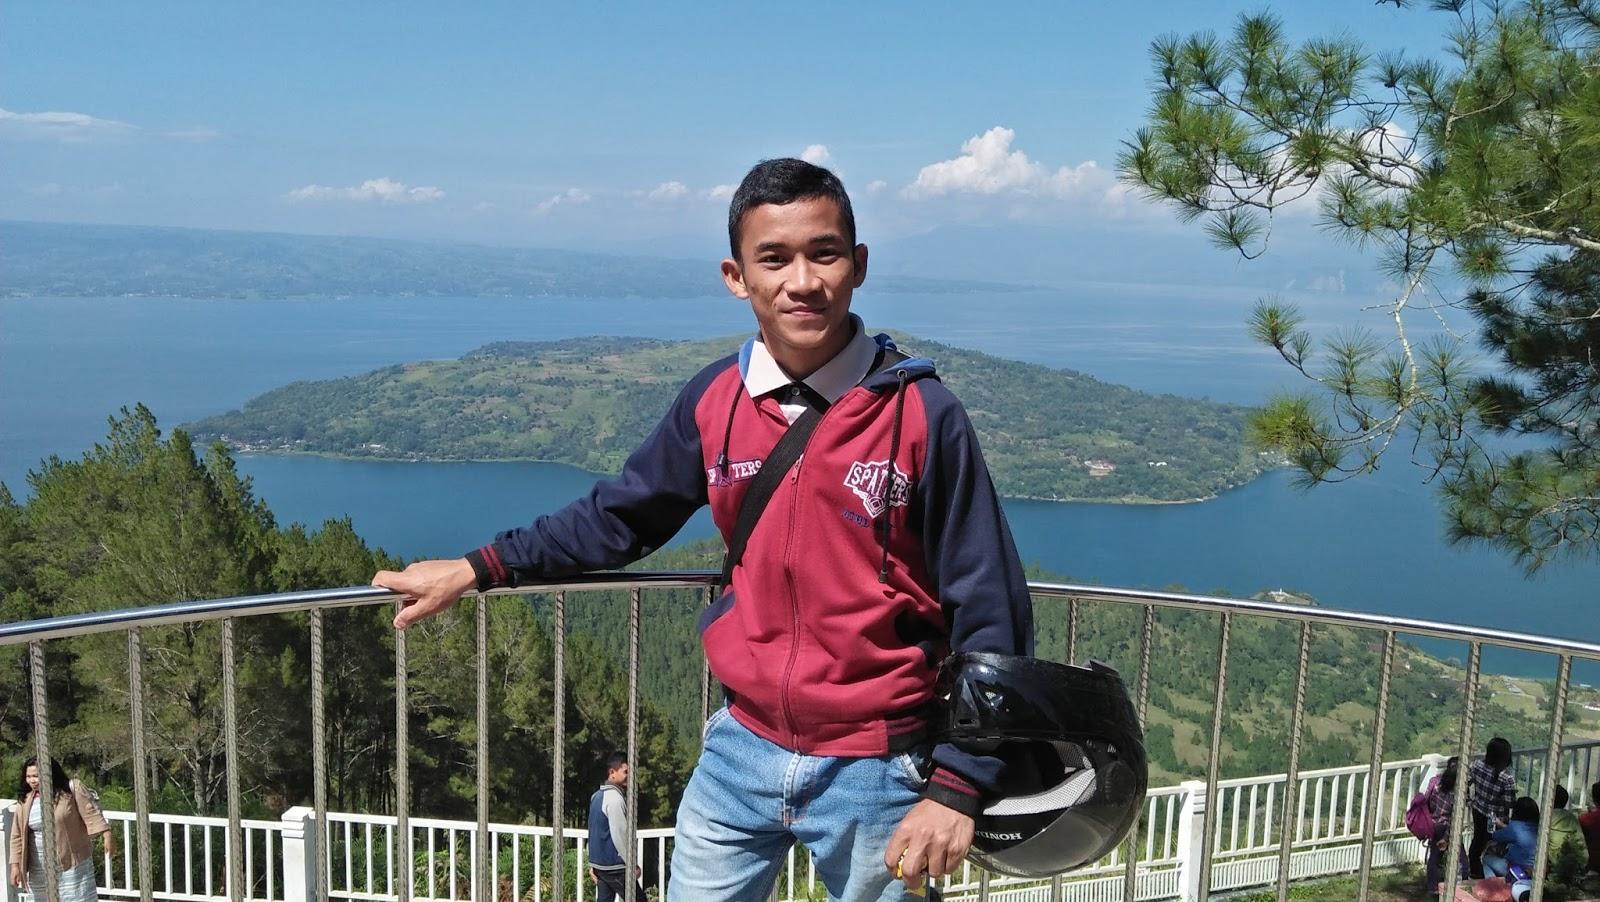 Objek Wisata Alam Taman Sipinsur Kabupaten Humbang Hasundutan Tempat Berlibur